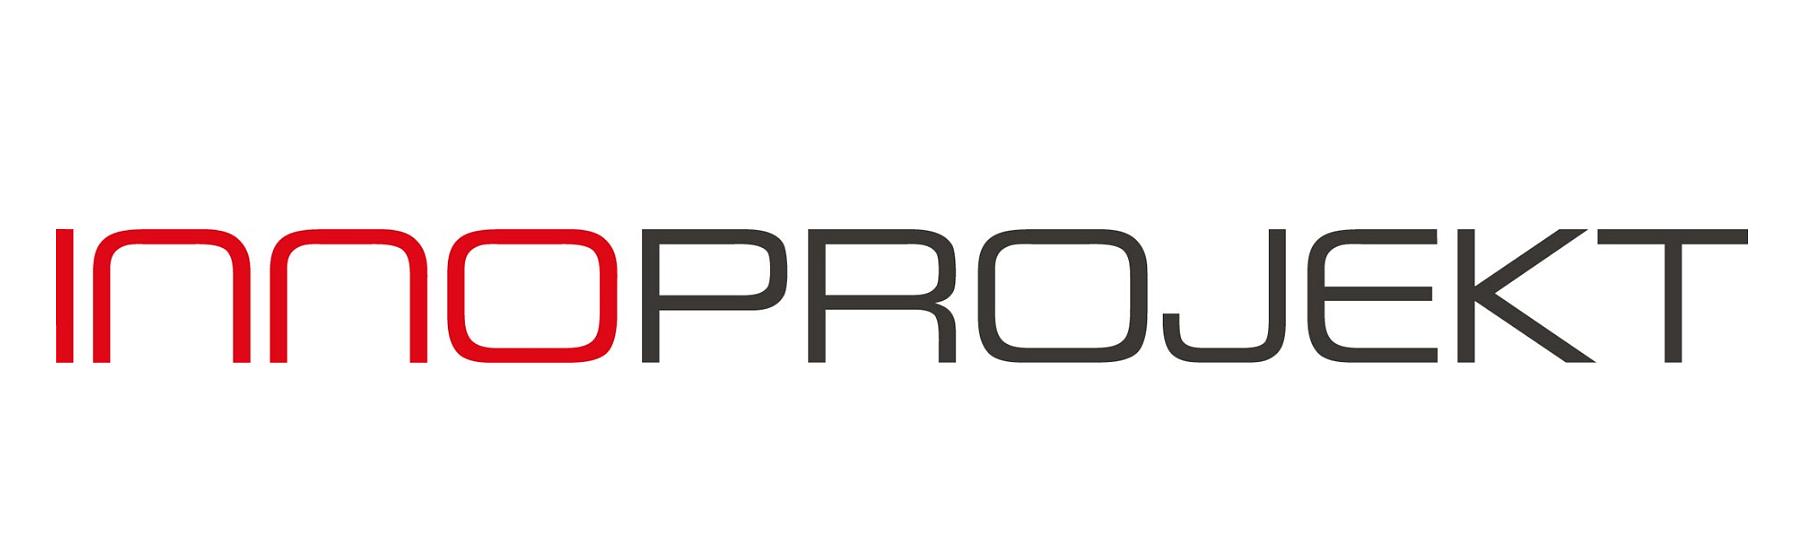 InnoProjekt AG Schweiz